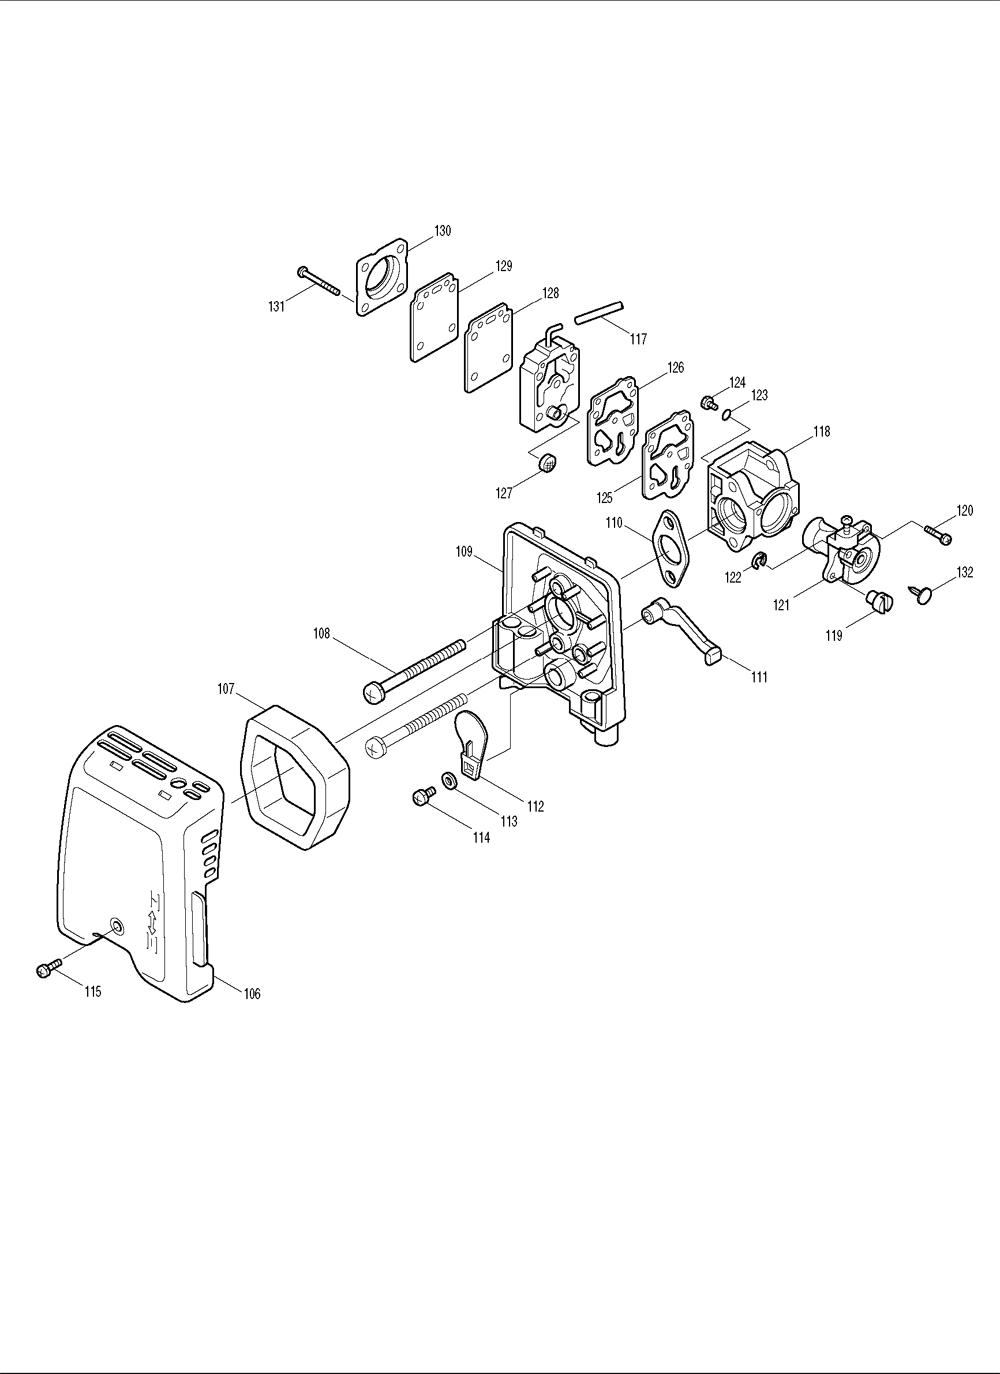 Makita-RBE250-250-PBBreak Down